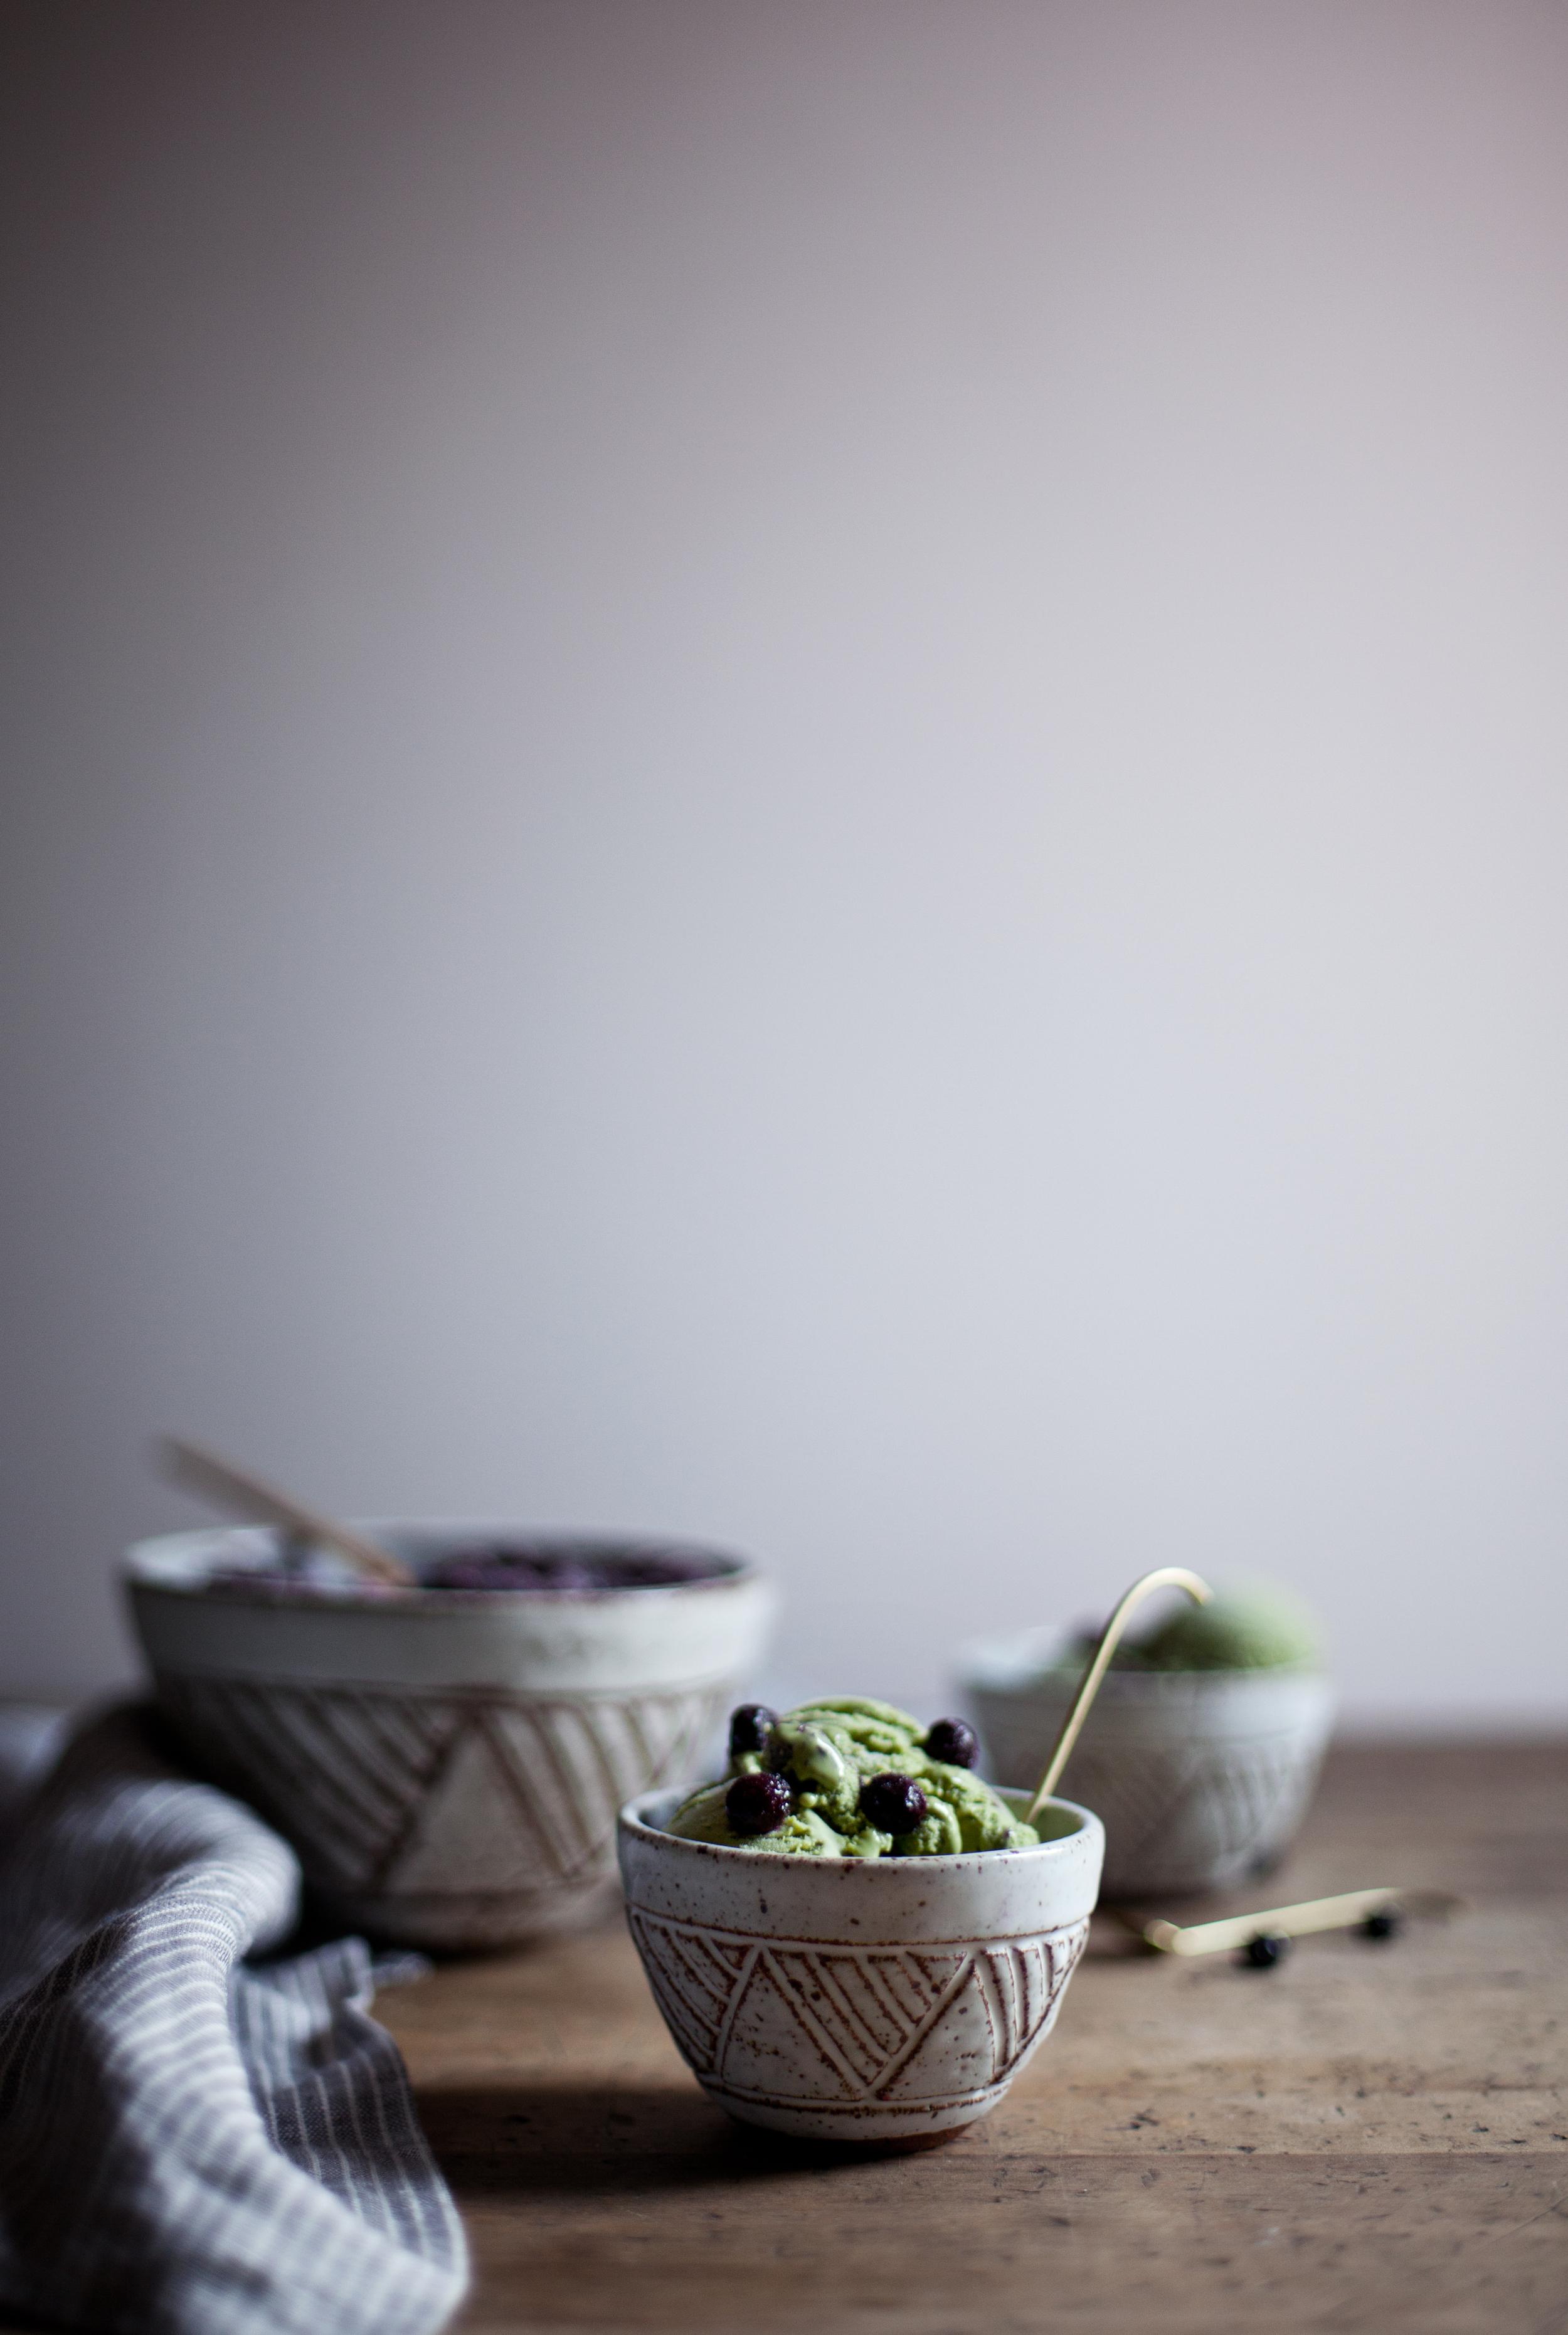 roasted blueberry green tea ice cream x.jpg